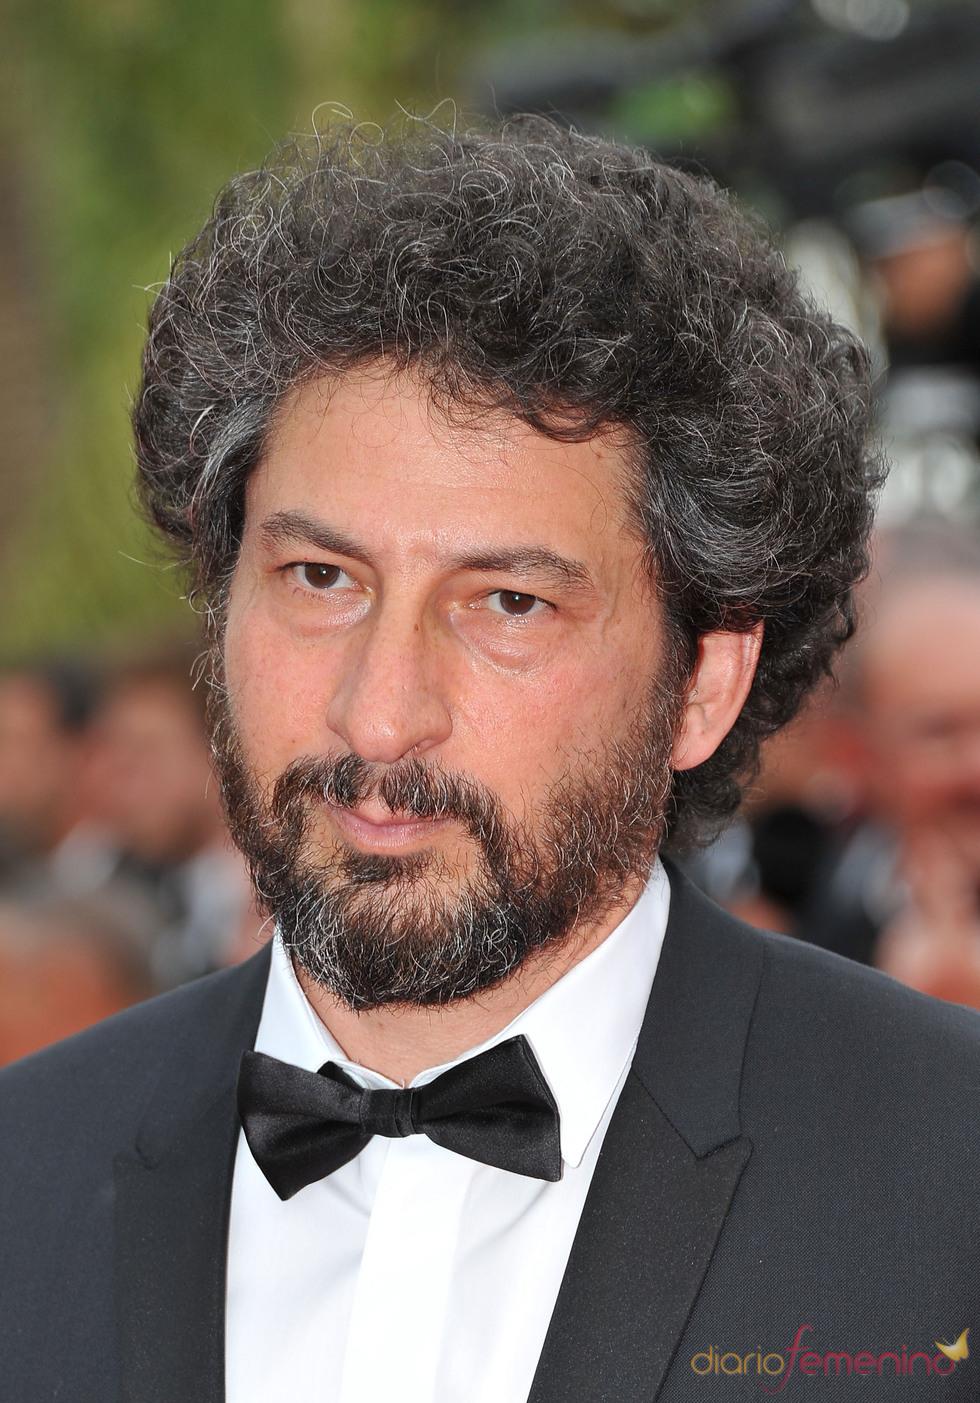 Radu Mihaileanu posa en la alfombra roja del Festival de Cine de Cannes 2011